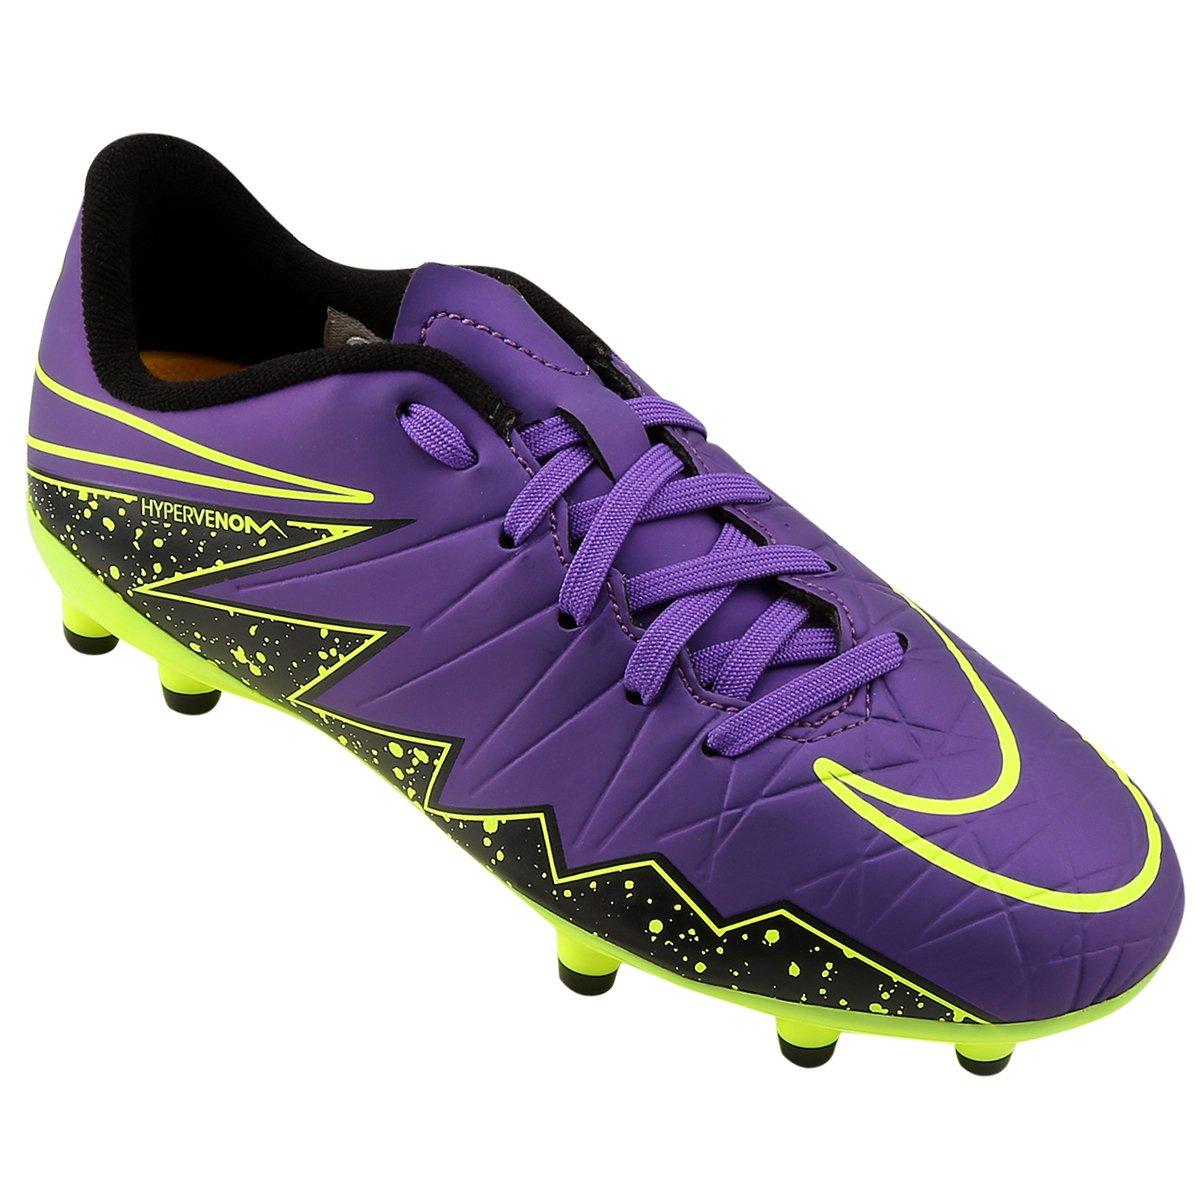 eae04e7705 Chuteira Nike Hypervenom Phelon 2 FG Infantil